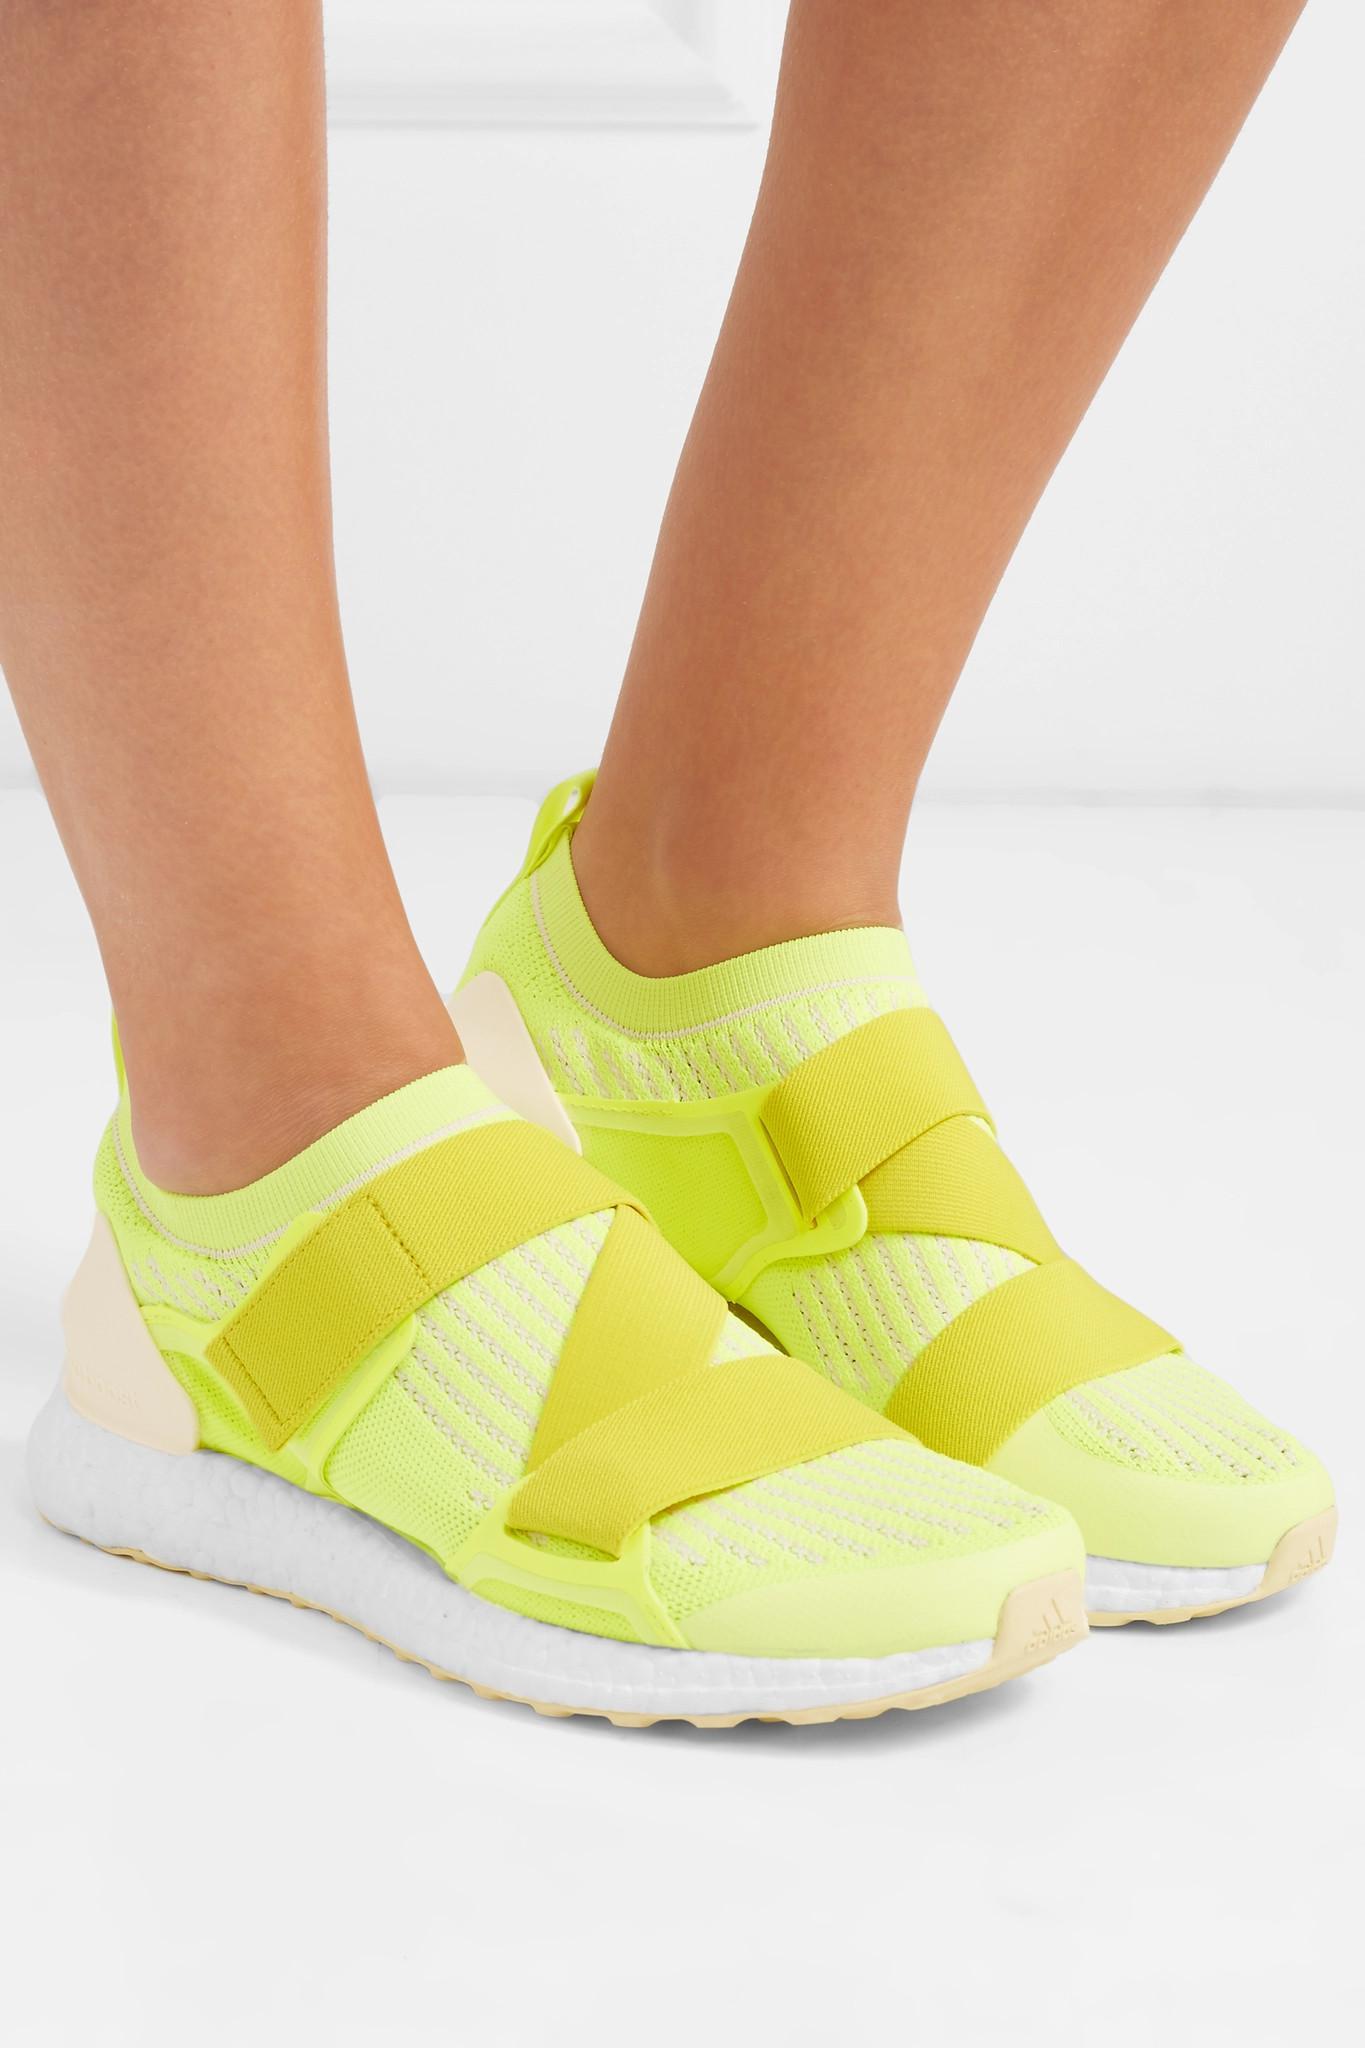 0bbf5b2219f Lyst - adidas By Stella McCartney Ultraboost X Neon Primeknit ...